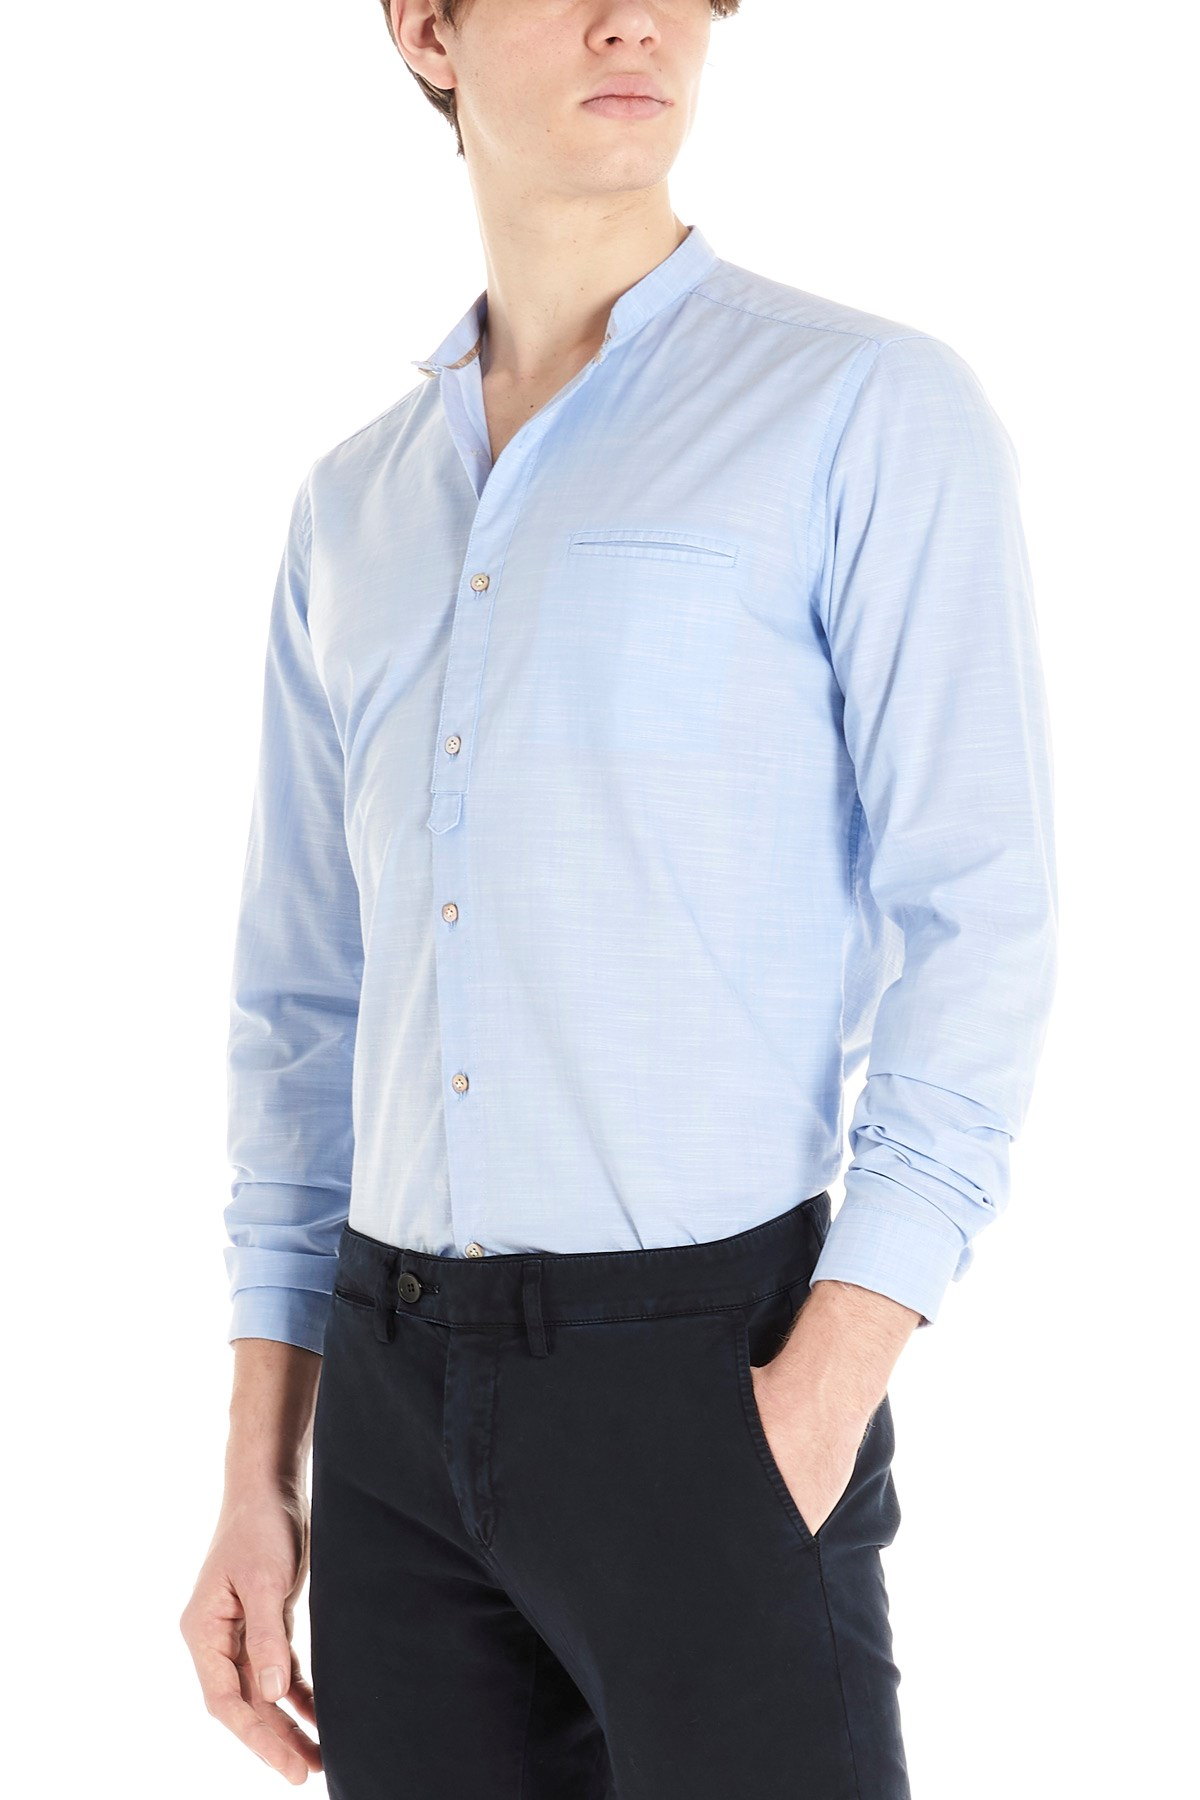 dnl Korean shirt available on www.julian-fashion.com - 5 - BE